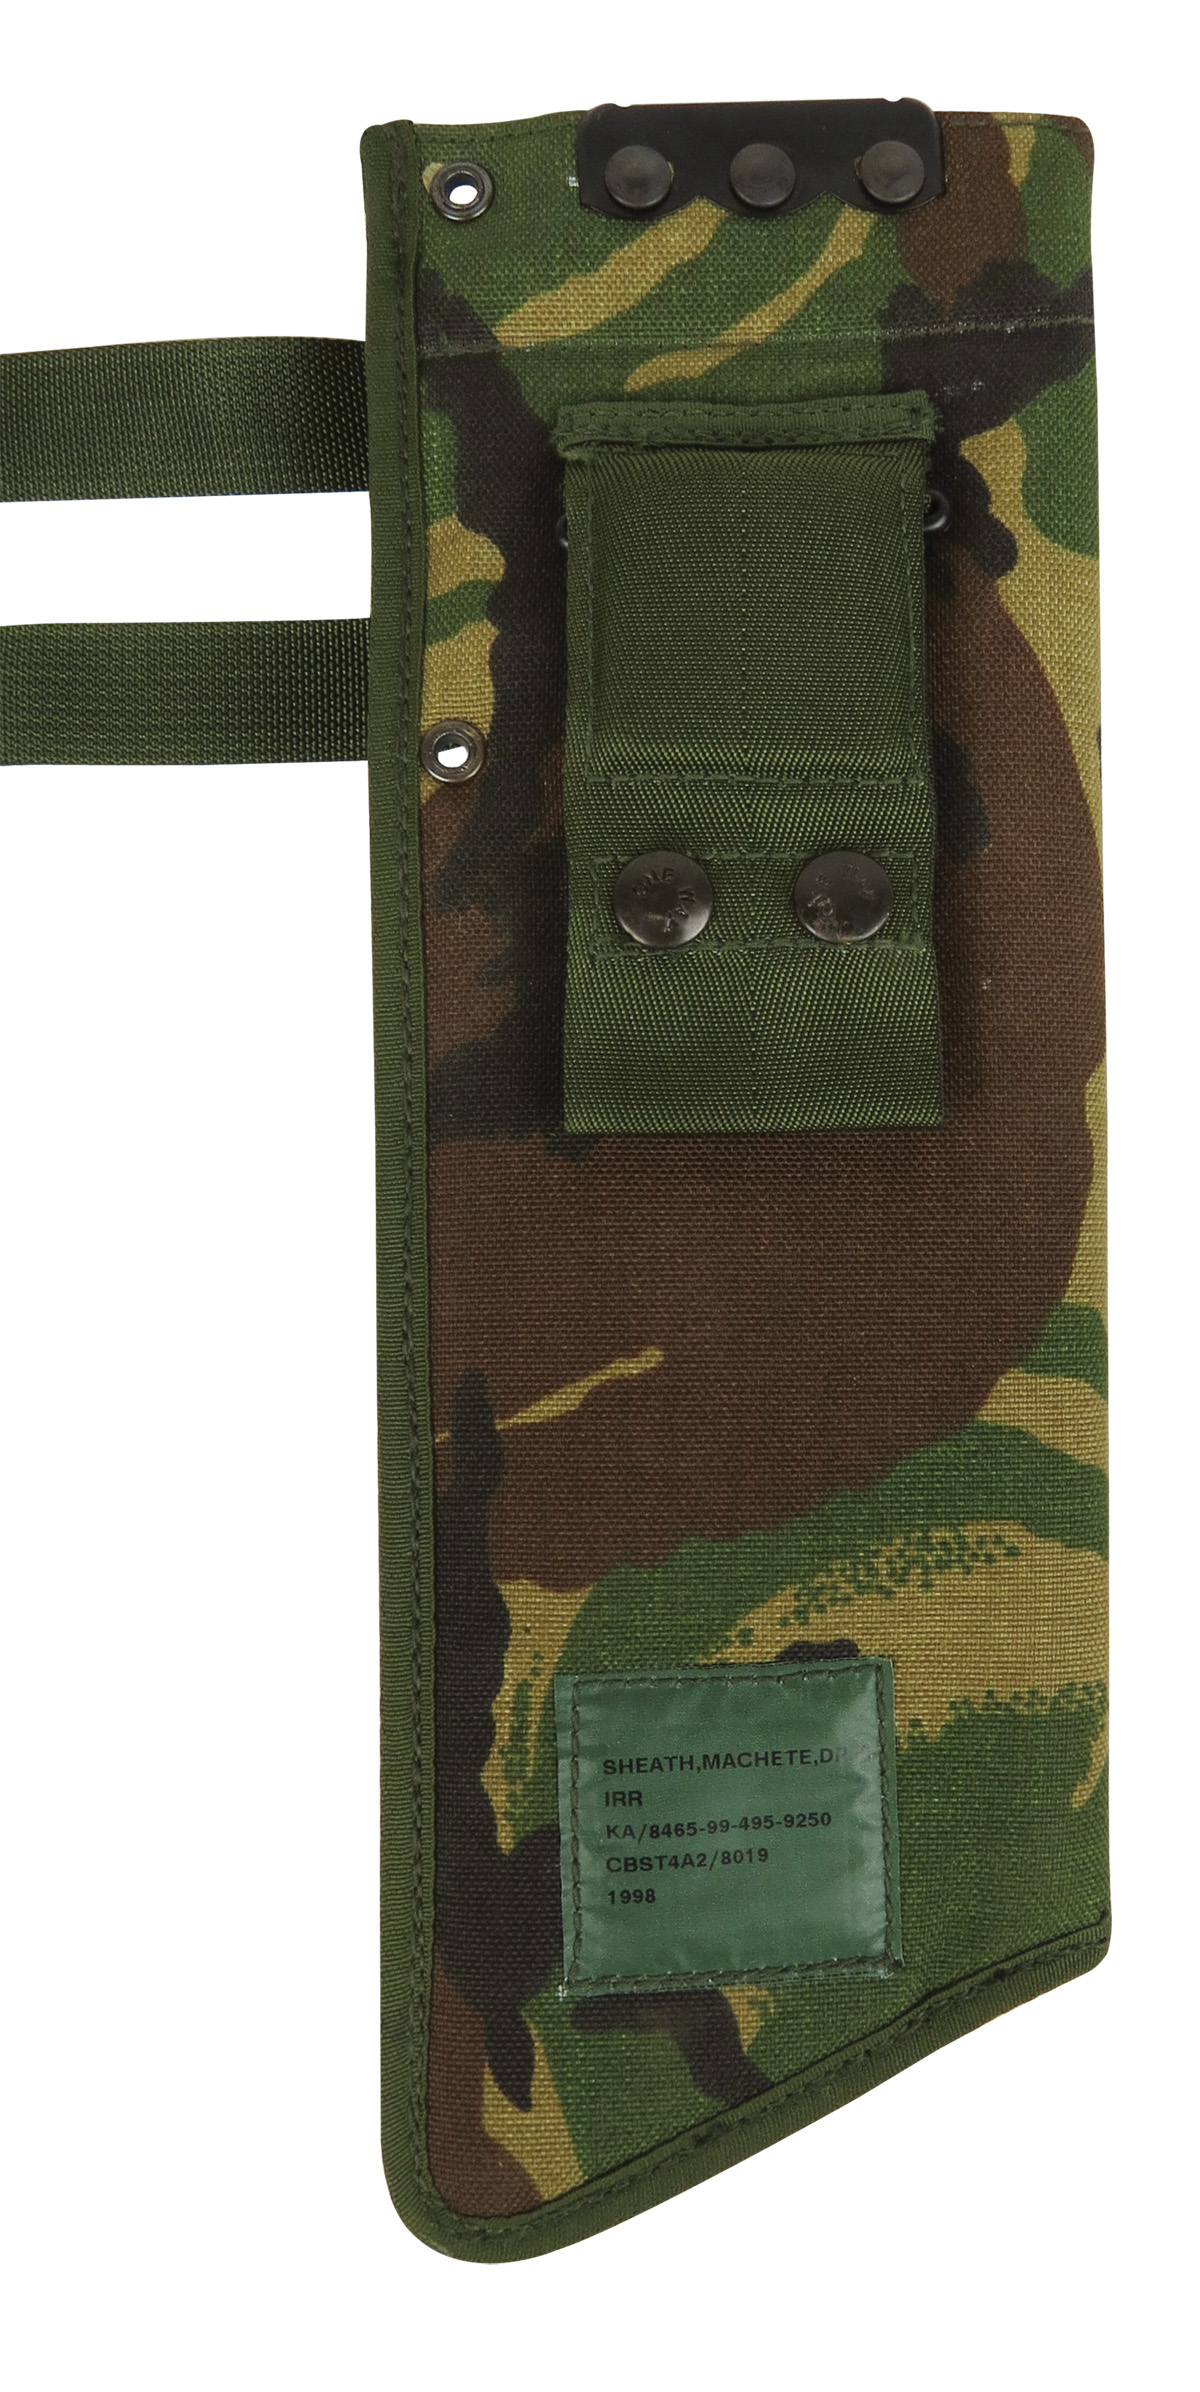 British Army Plce Machete Sheath